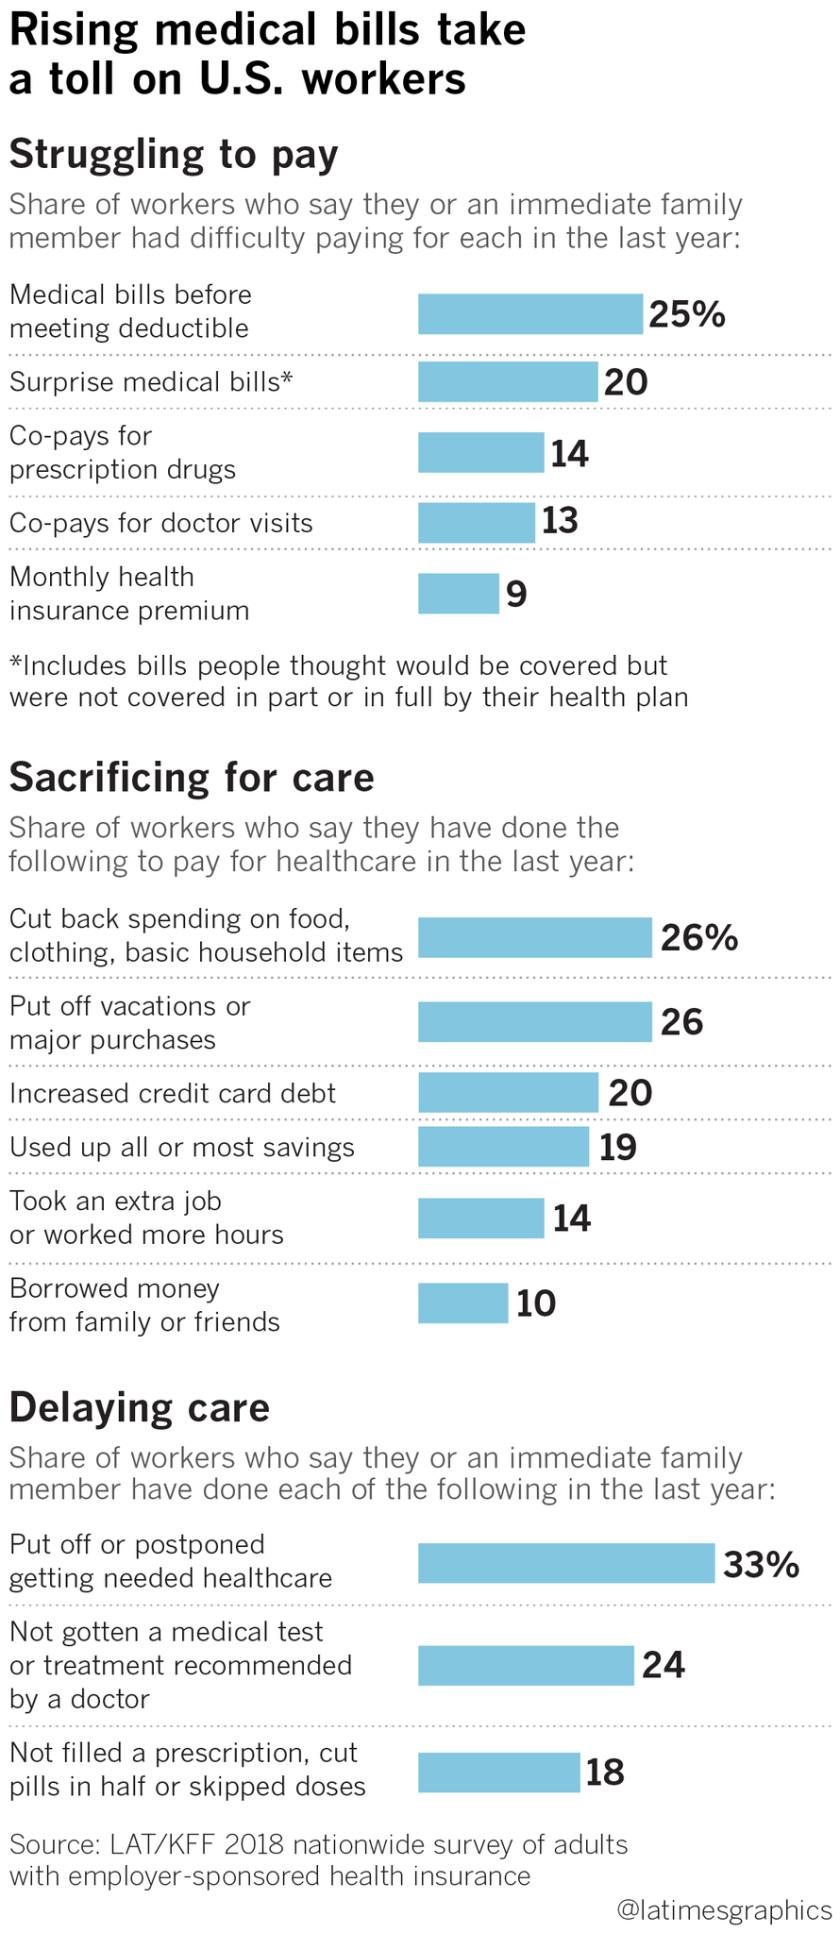 la-na-pol-health-insurance-medical-bills-20190502-web-2